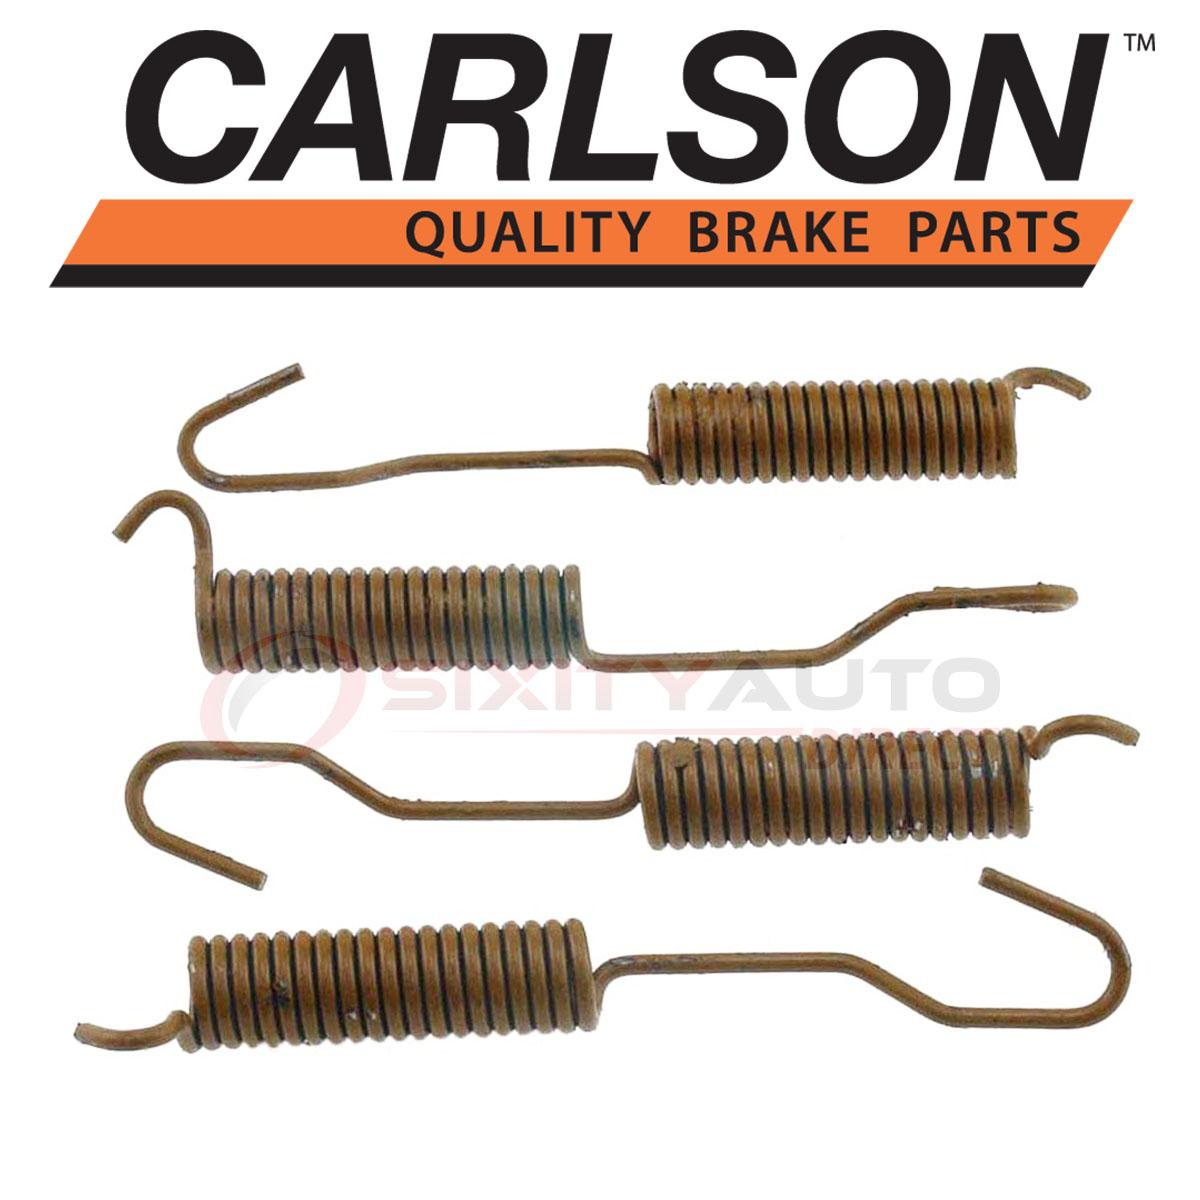 Carlson Quality Brake Parts H358 Brake Return Spring